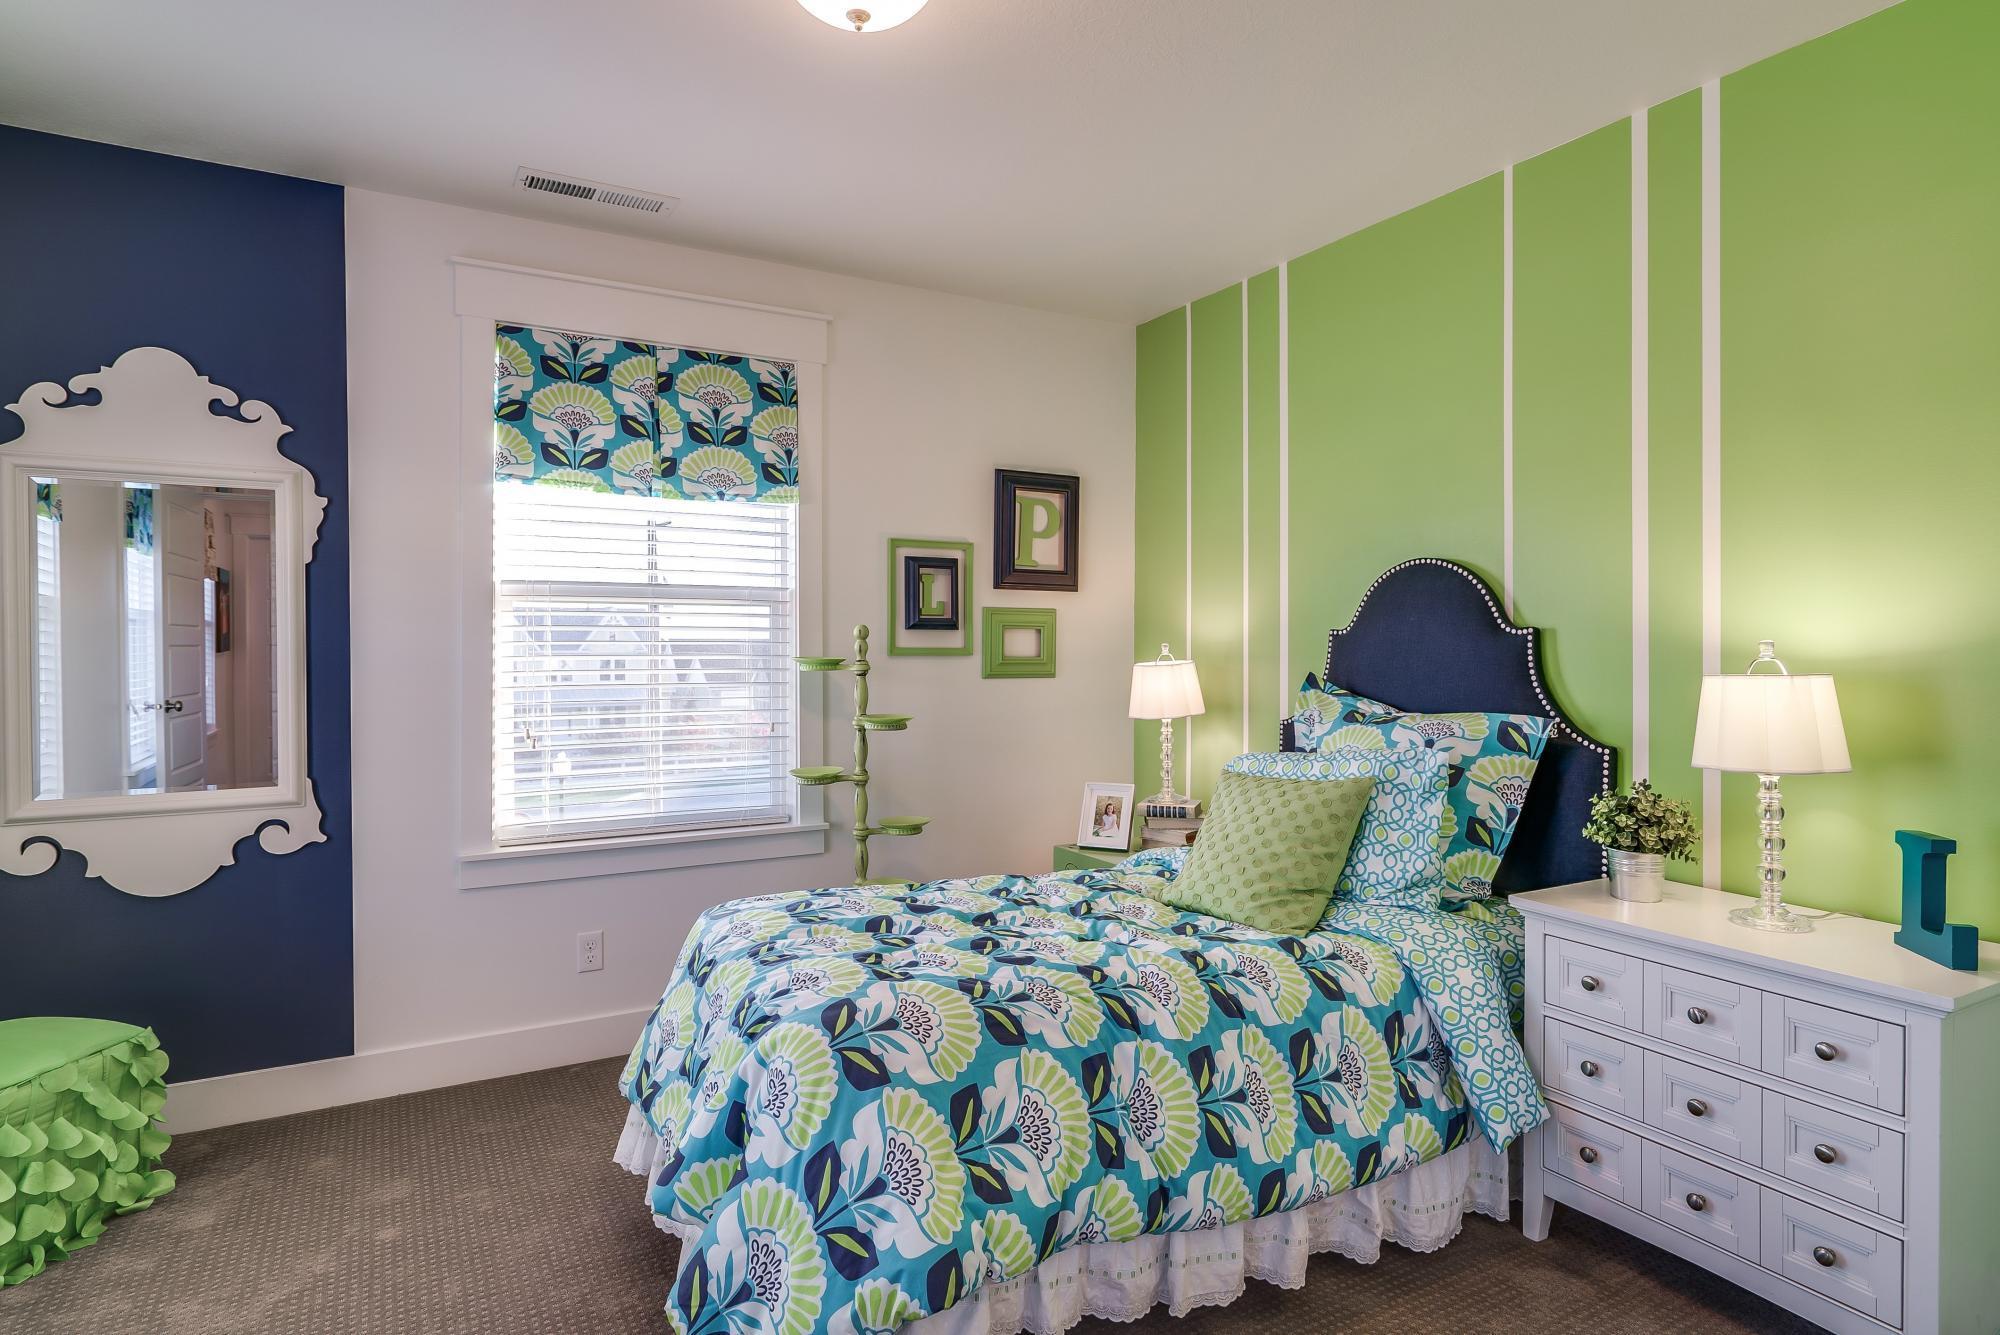 Bedroom featured in the Linden By Destination Homes in Salt Lake City-Ogden, UT